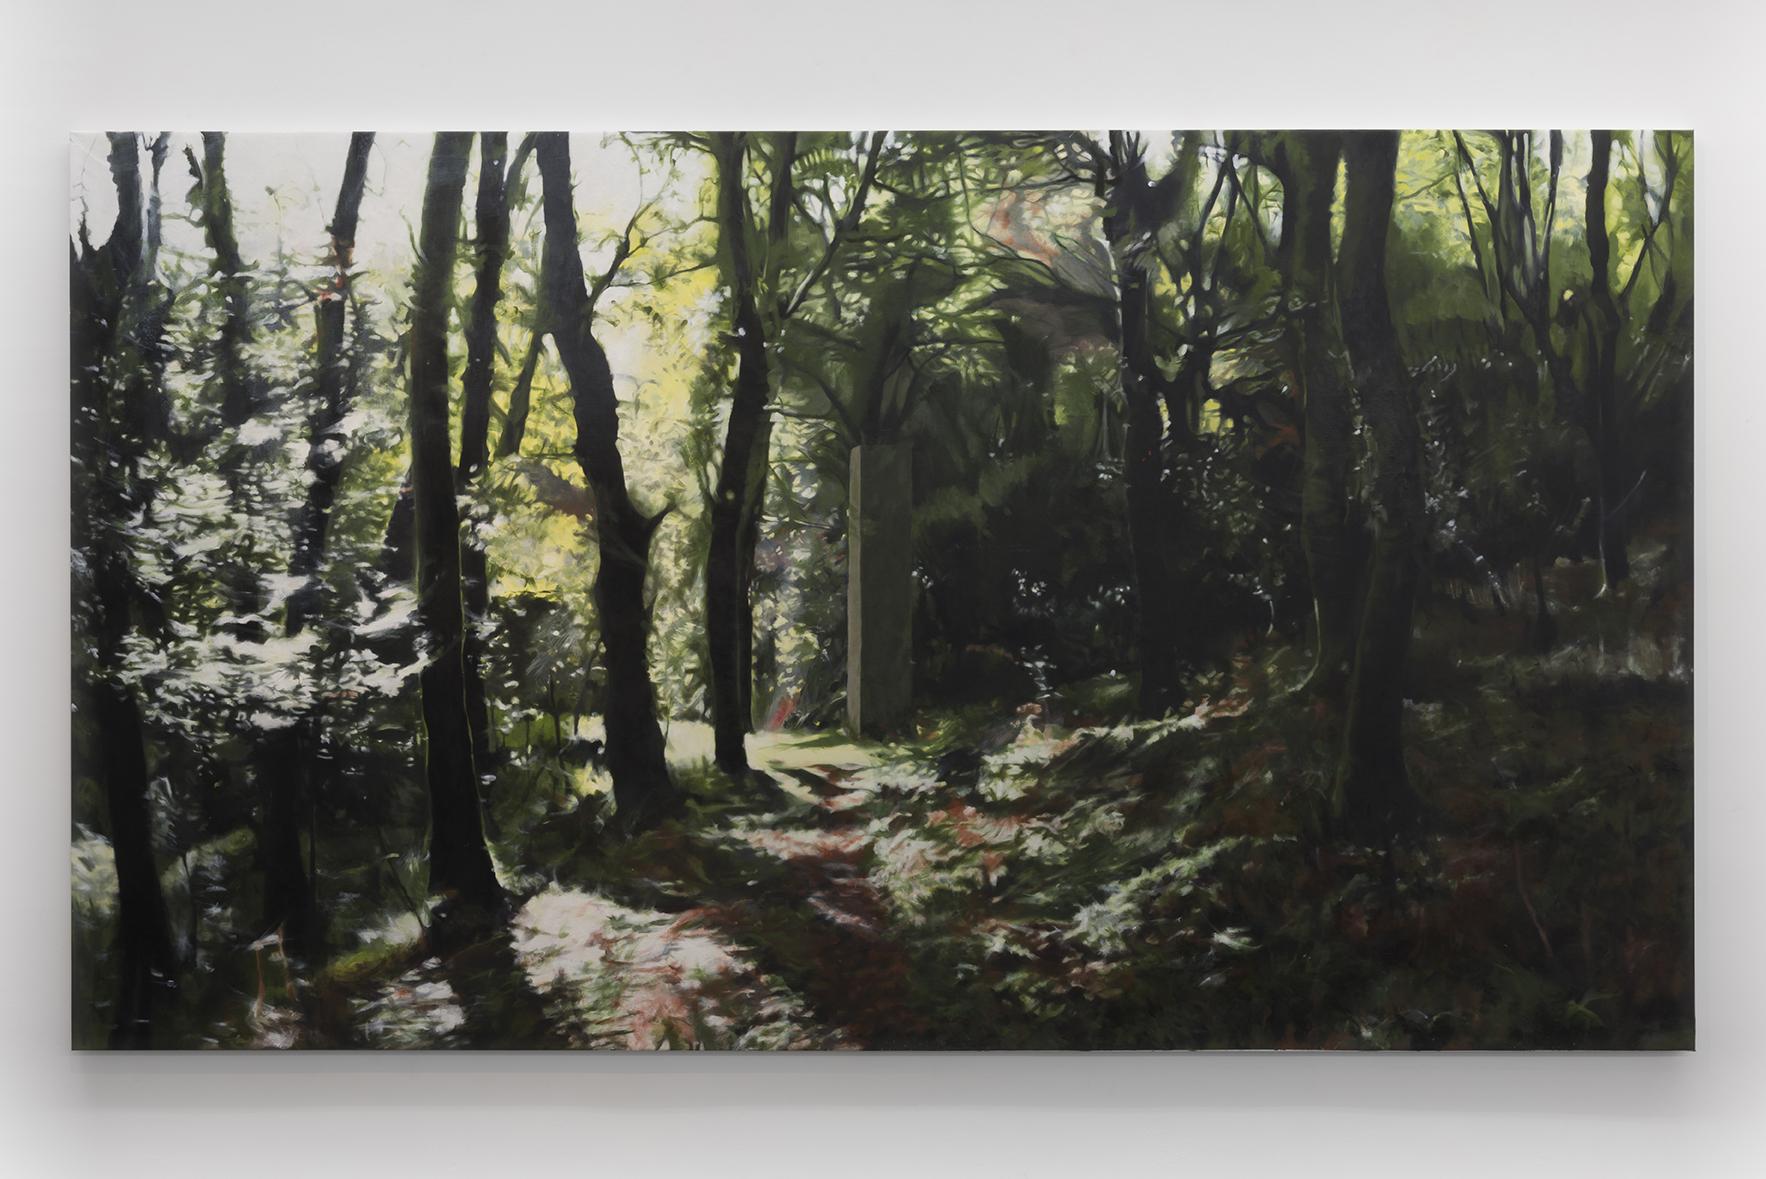 COLUMNA I, 2012-2015. Óleo sobre lienzo. 186 x 330 cm